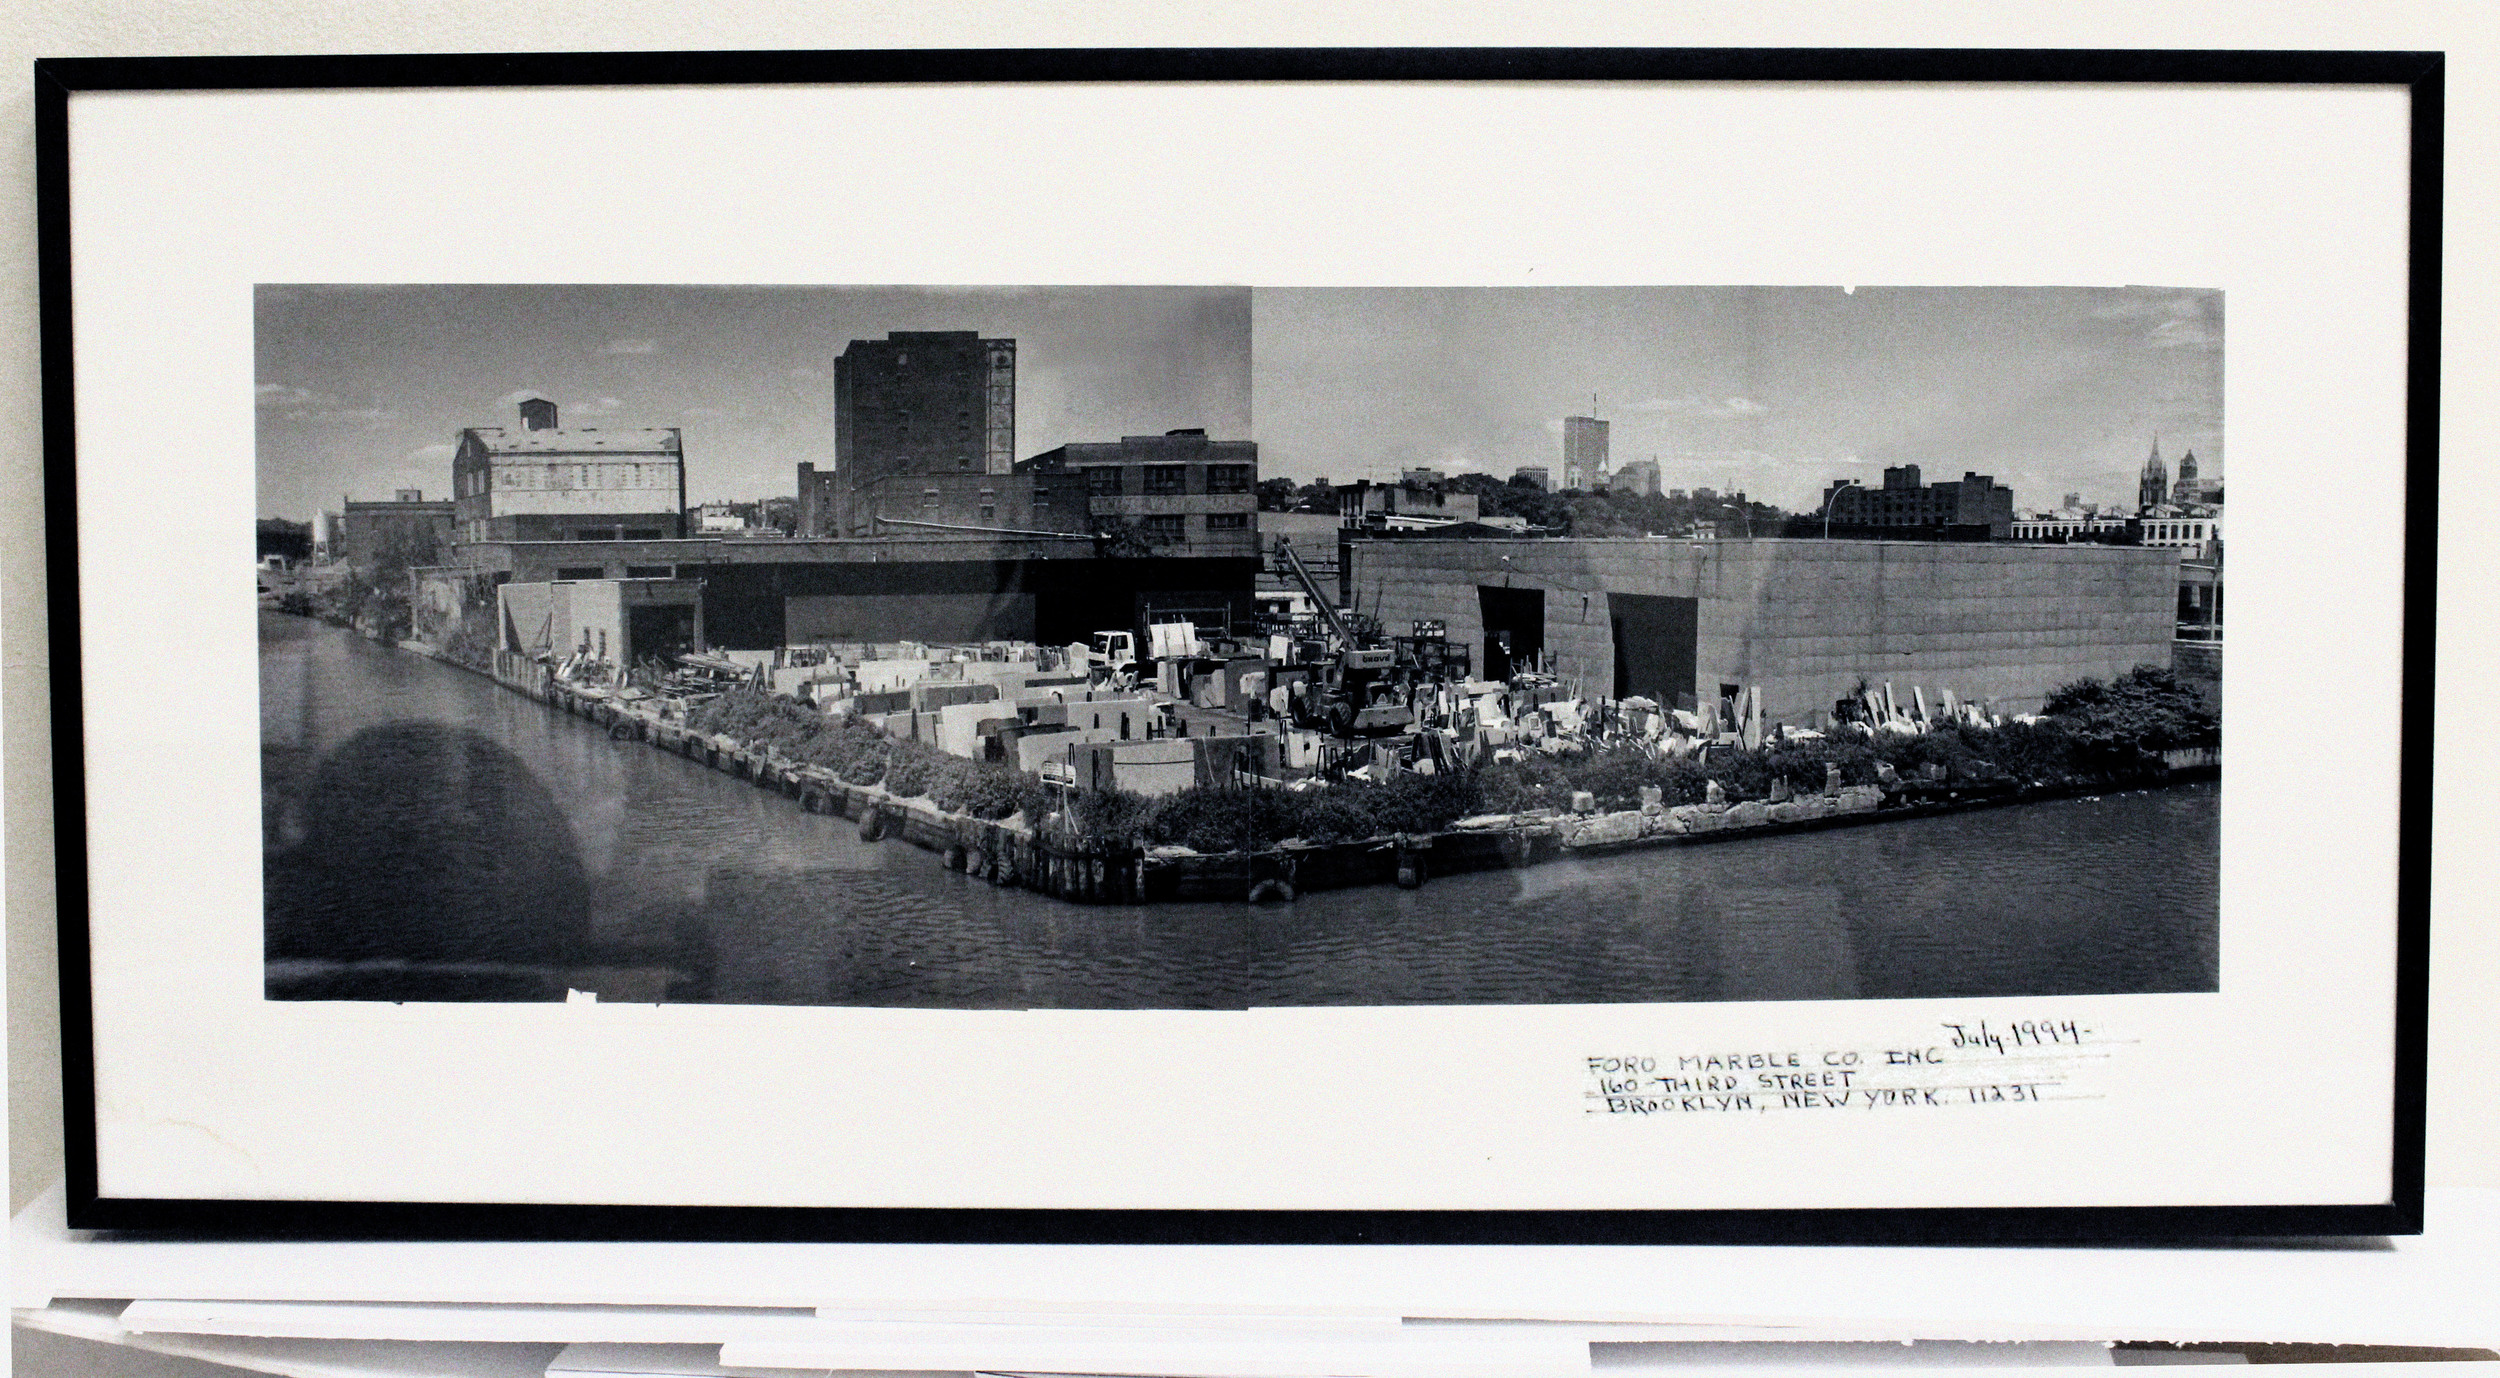 Original foro Marble location. - gowanus canal, brooklyn nyc, circa 1994